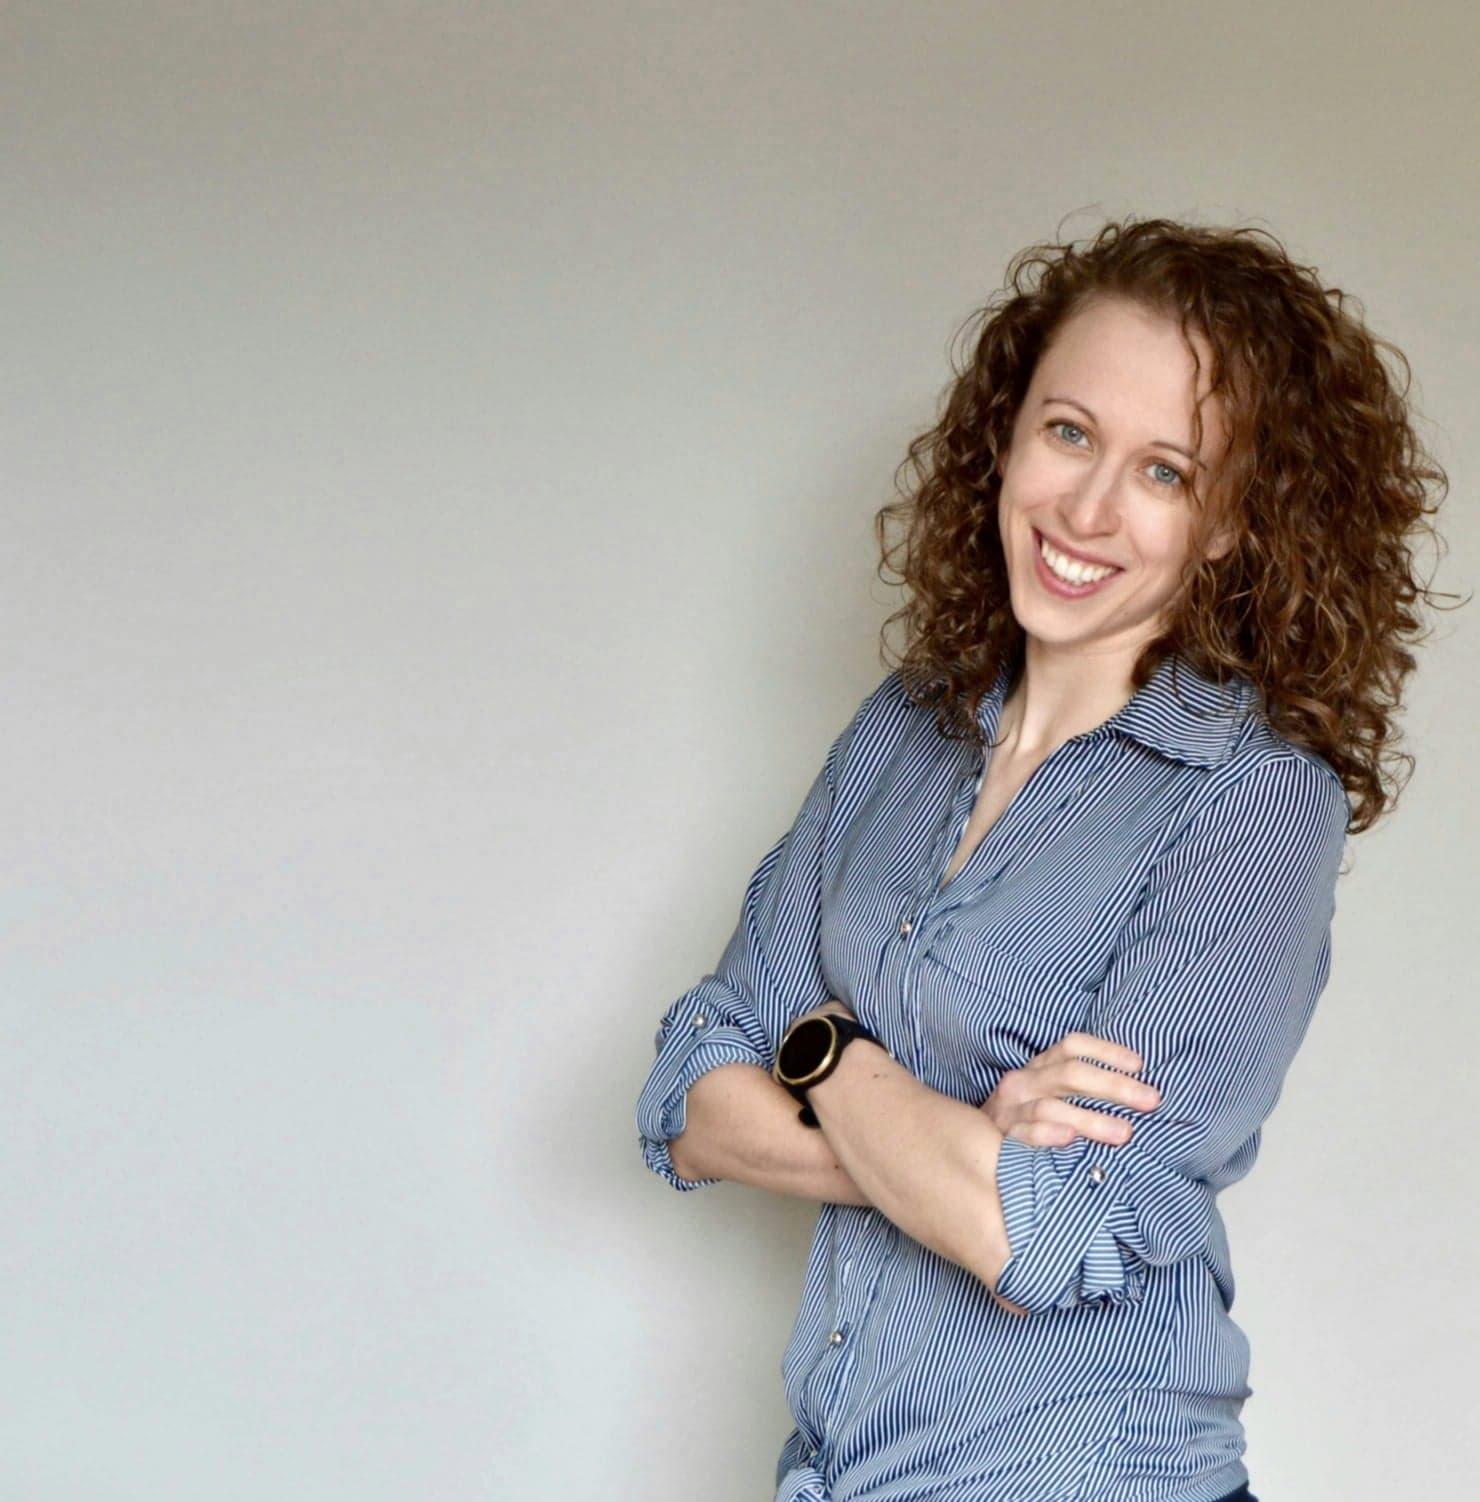 Emilie-Julie Dumontier